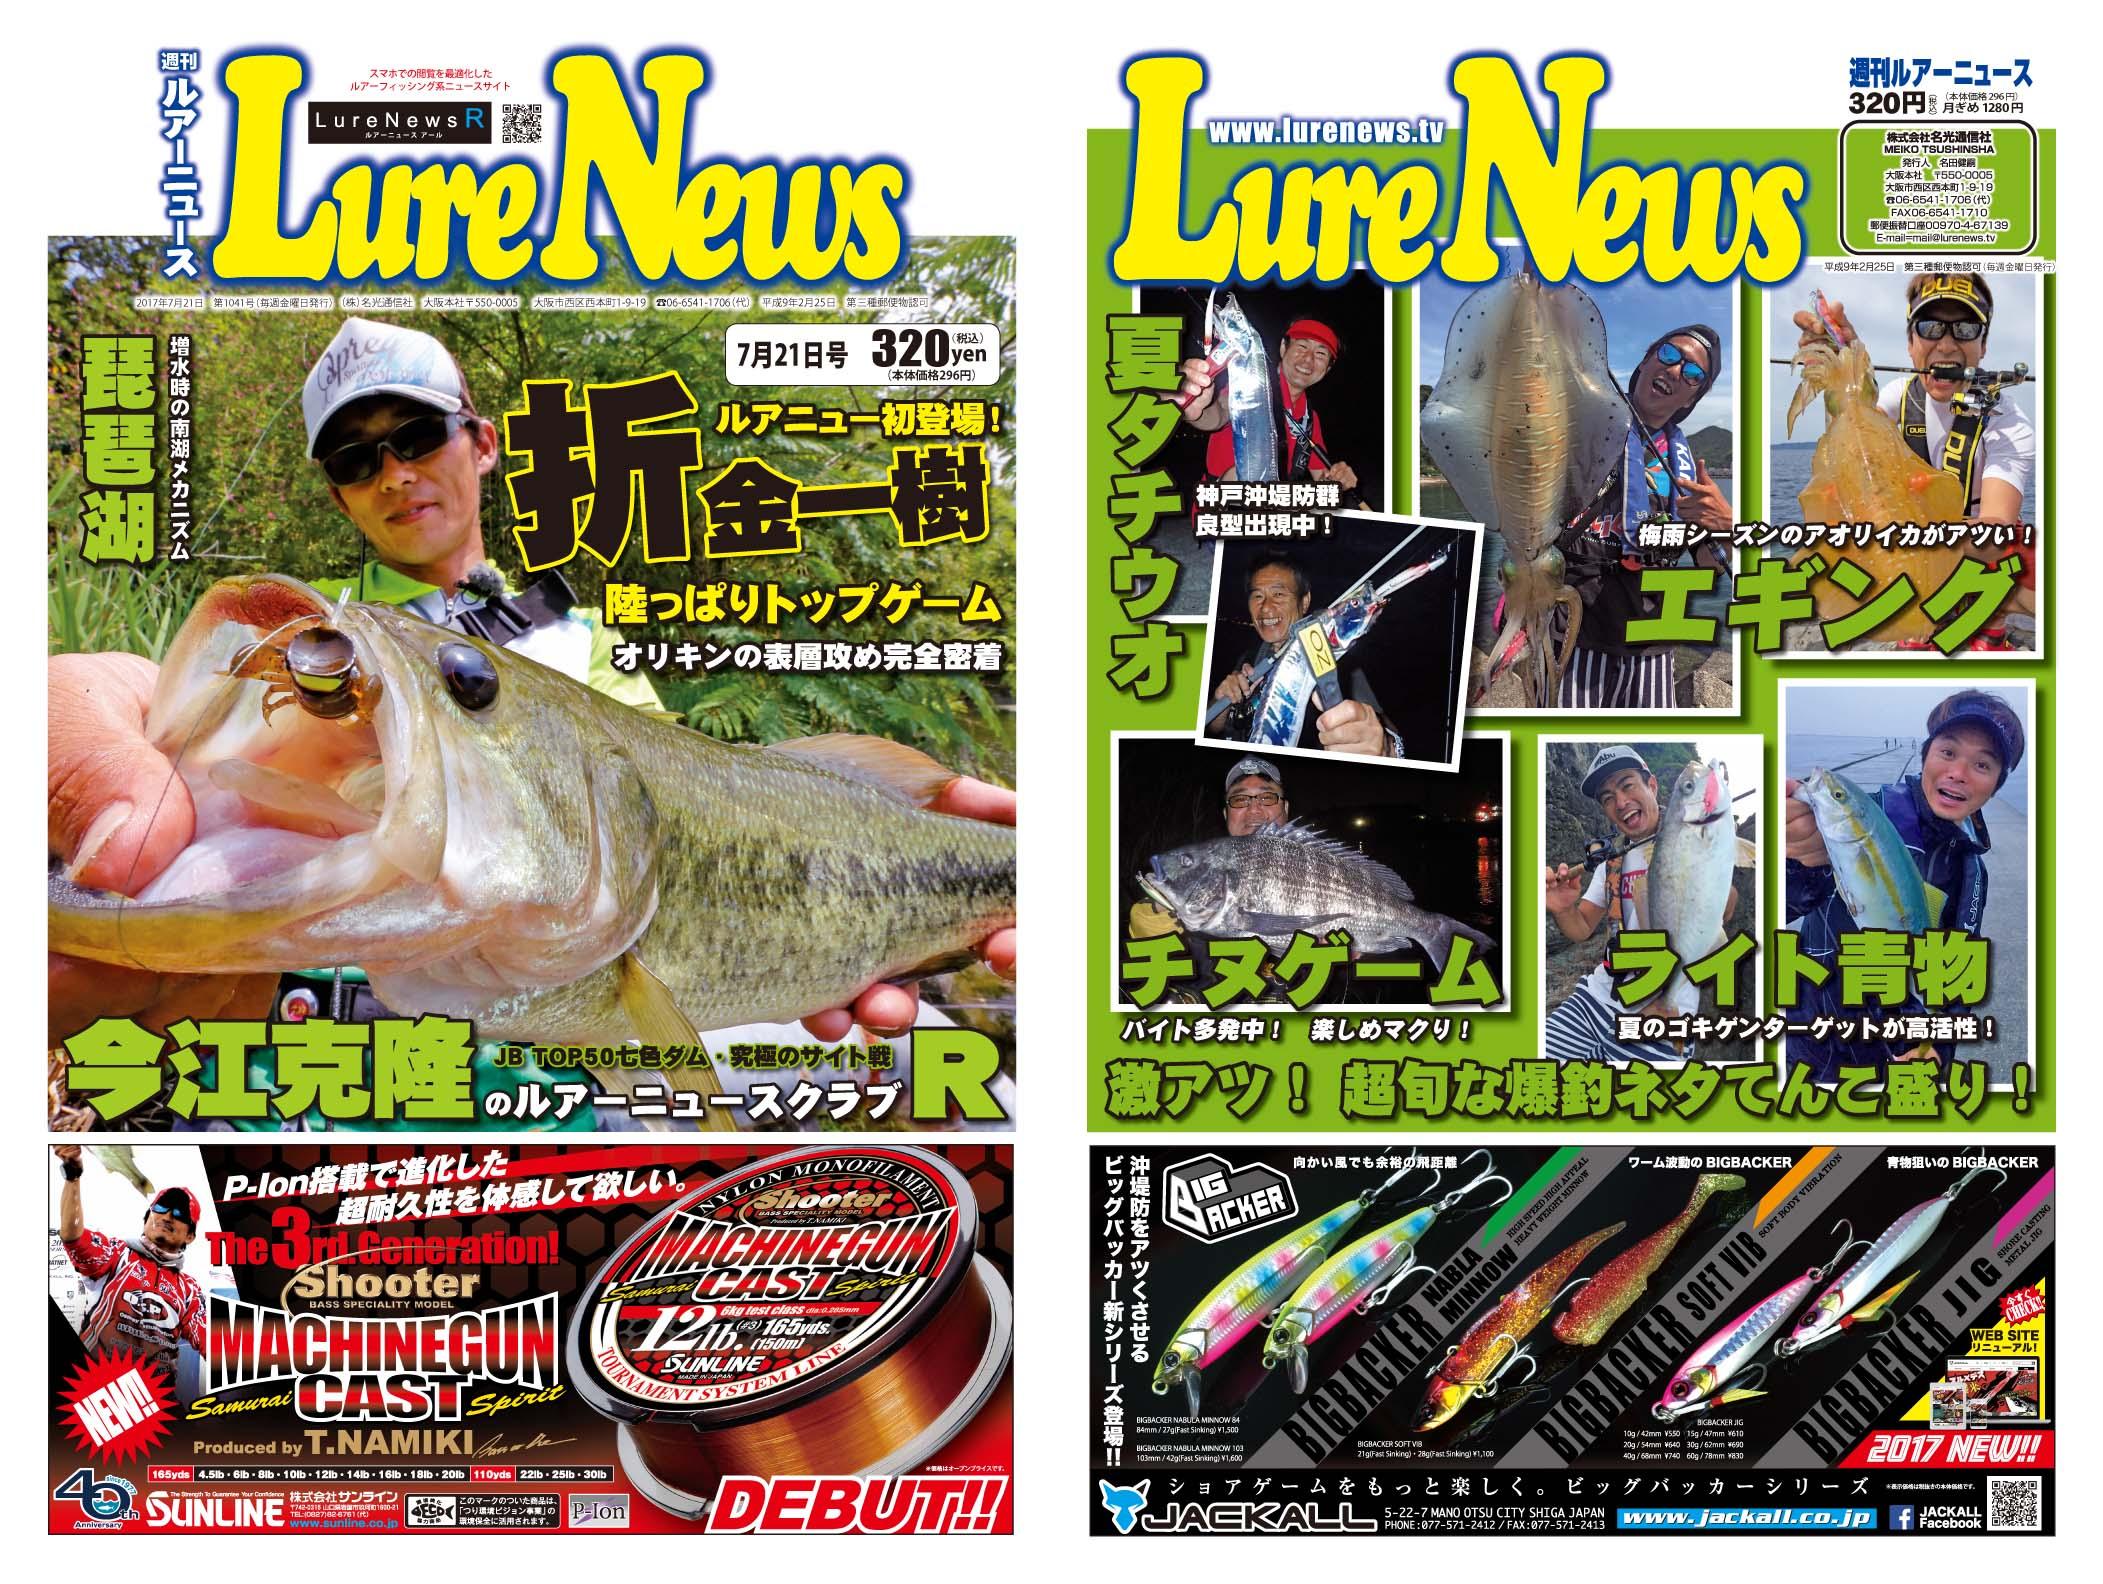 http://lurenews.tv/LureNews1041hyousi.jpg